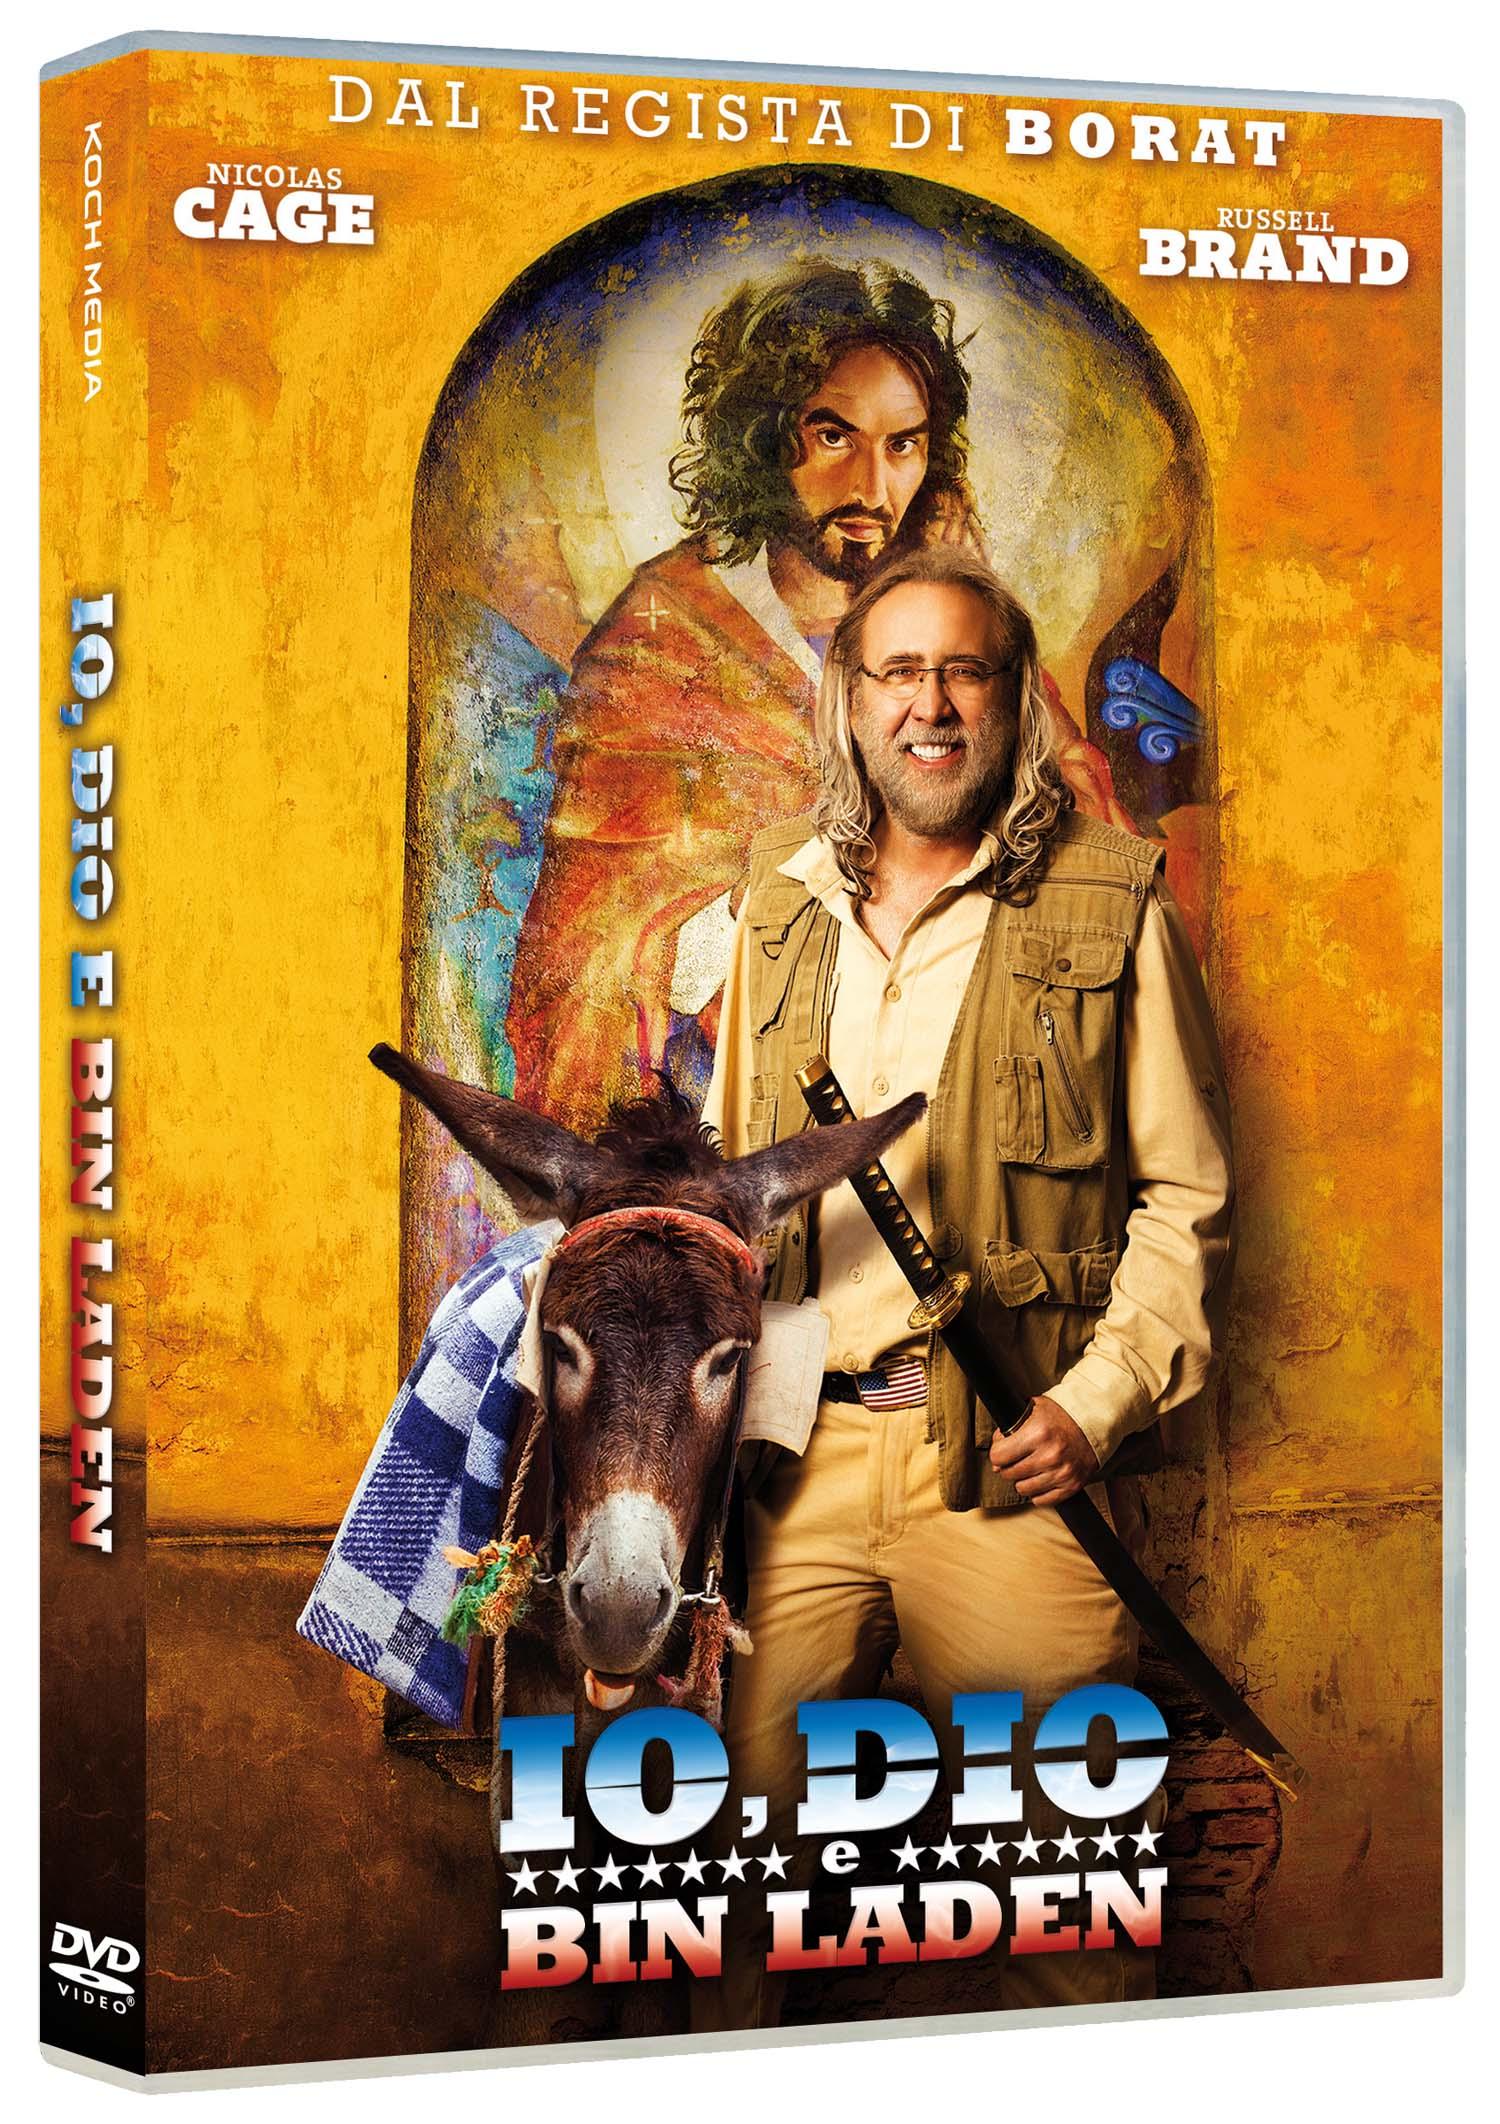 IO DIO E BIN LADEN (DVD)